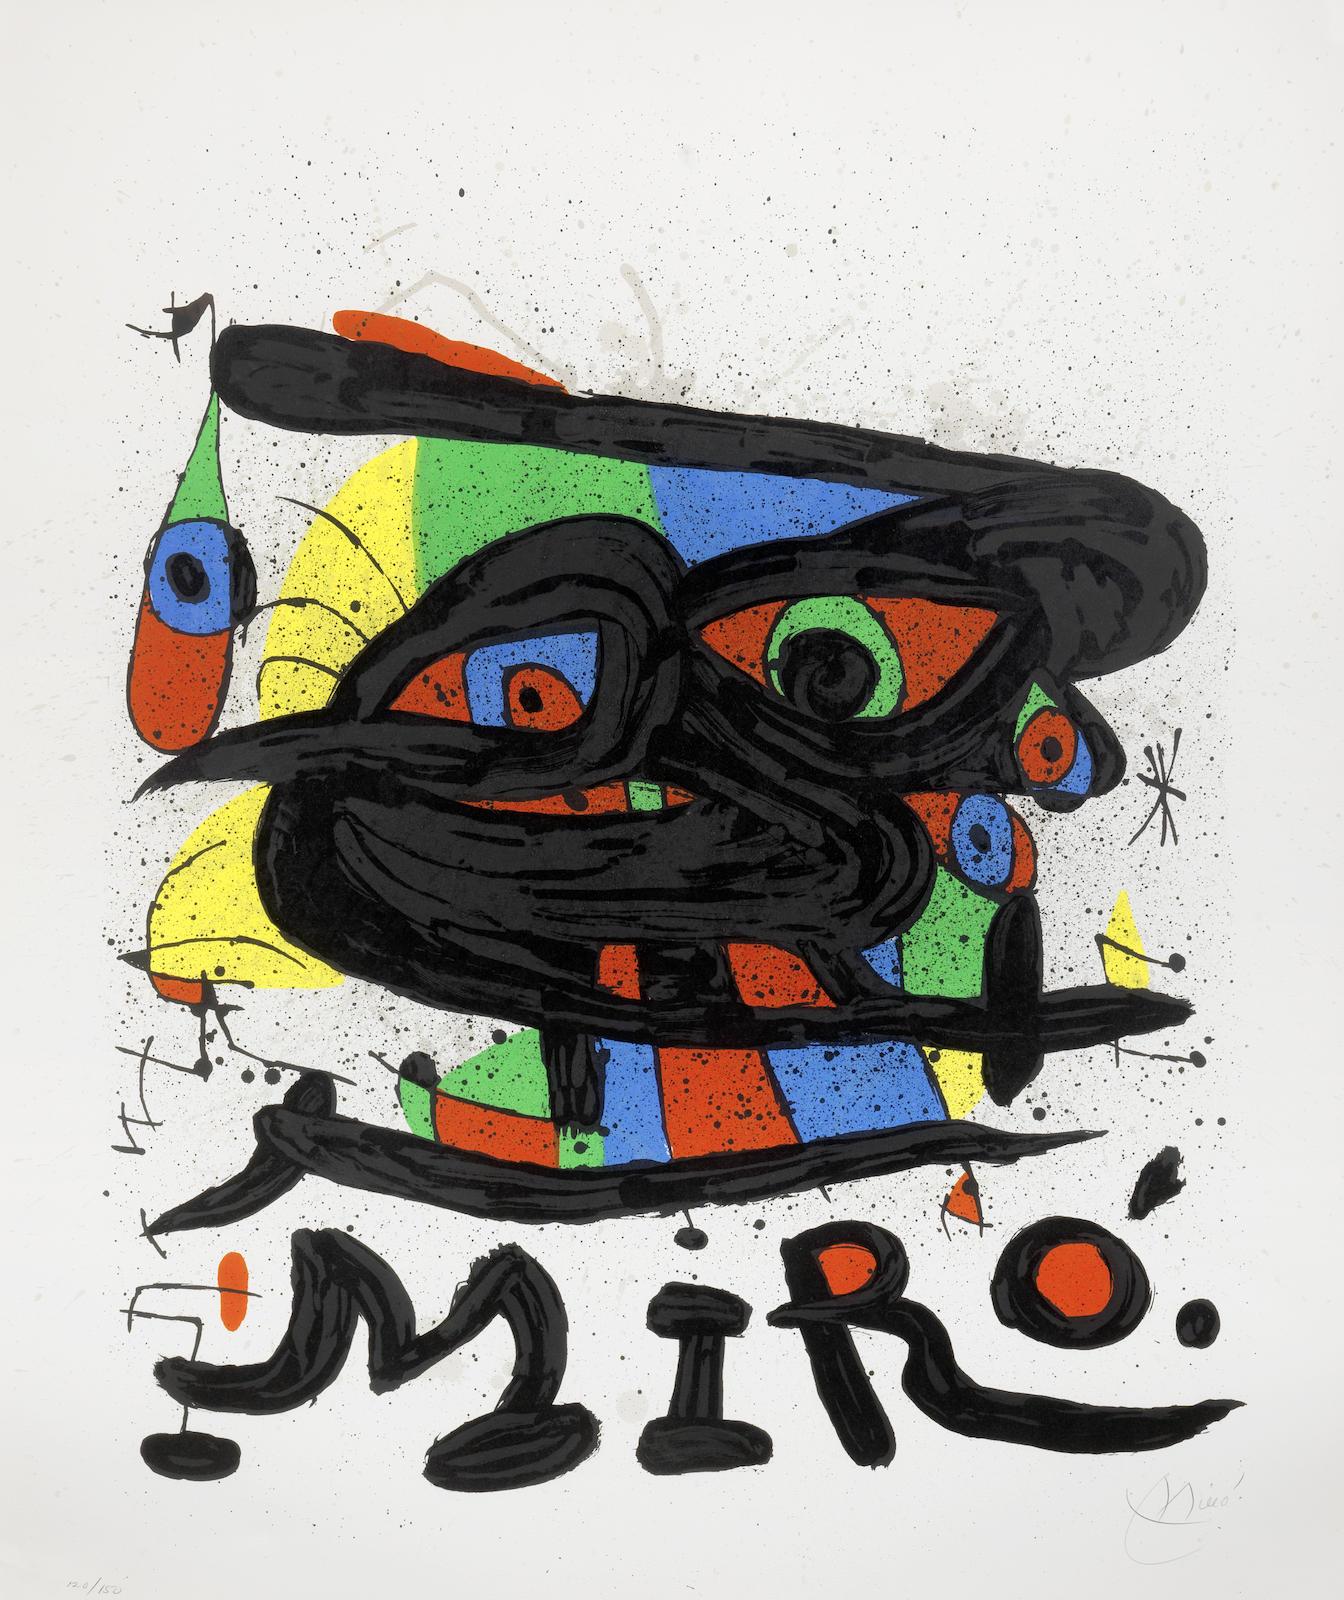 Joan Miro-Poster for the exhibition Miro Sculptures-1971